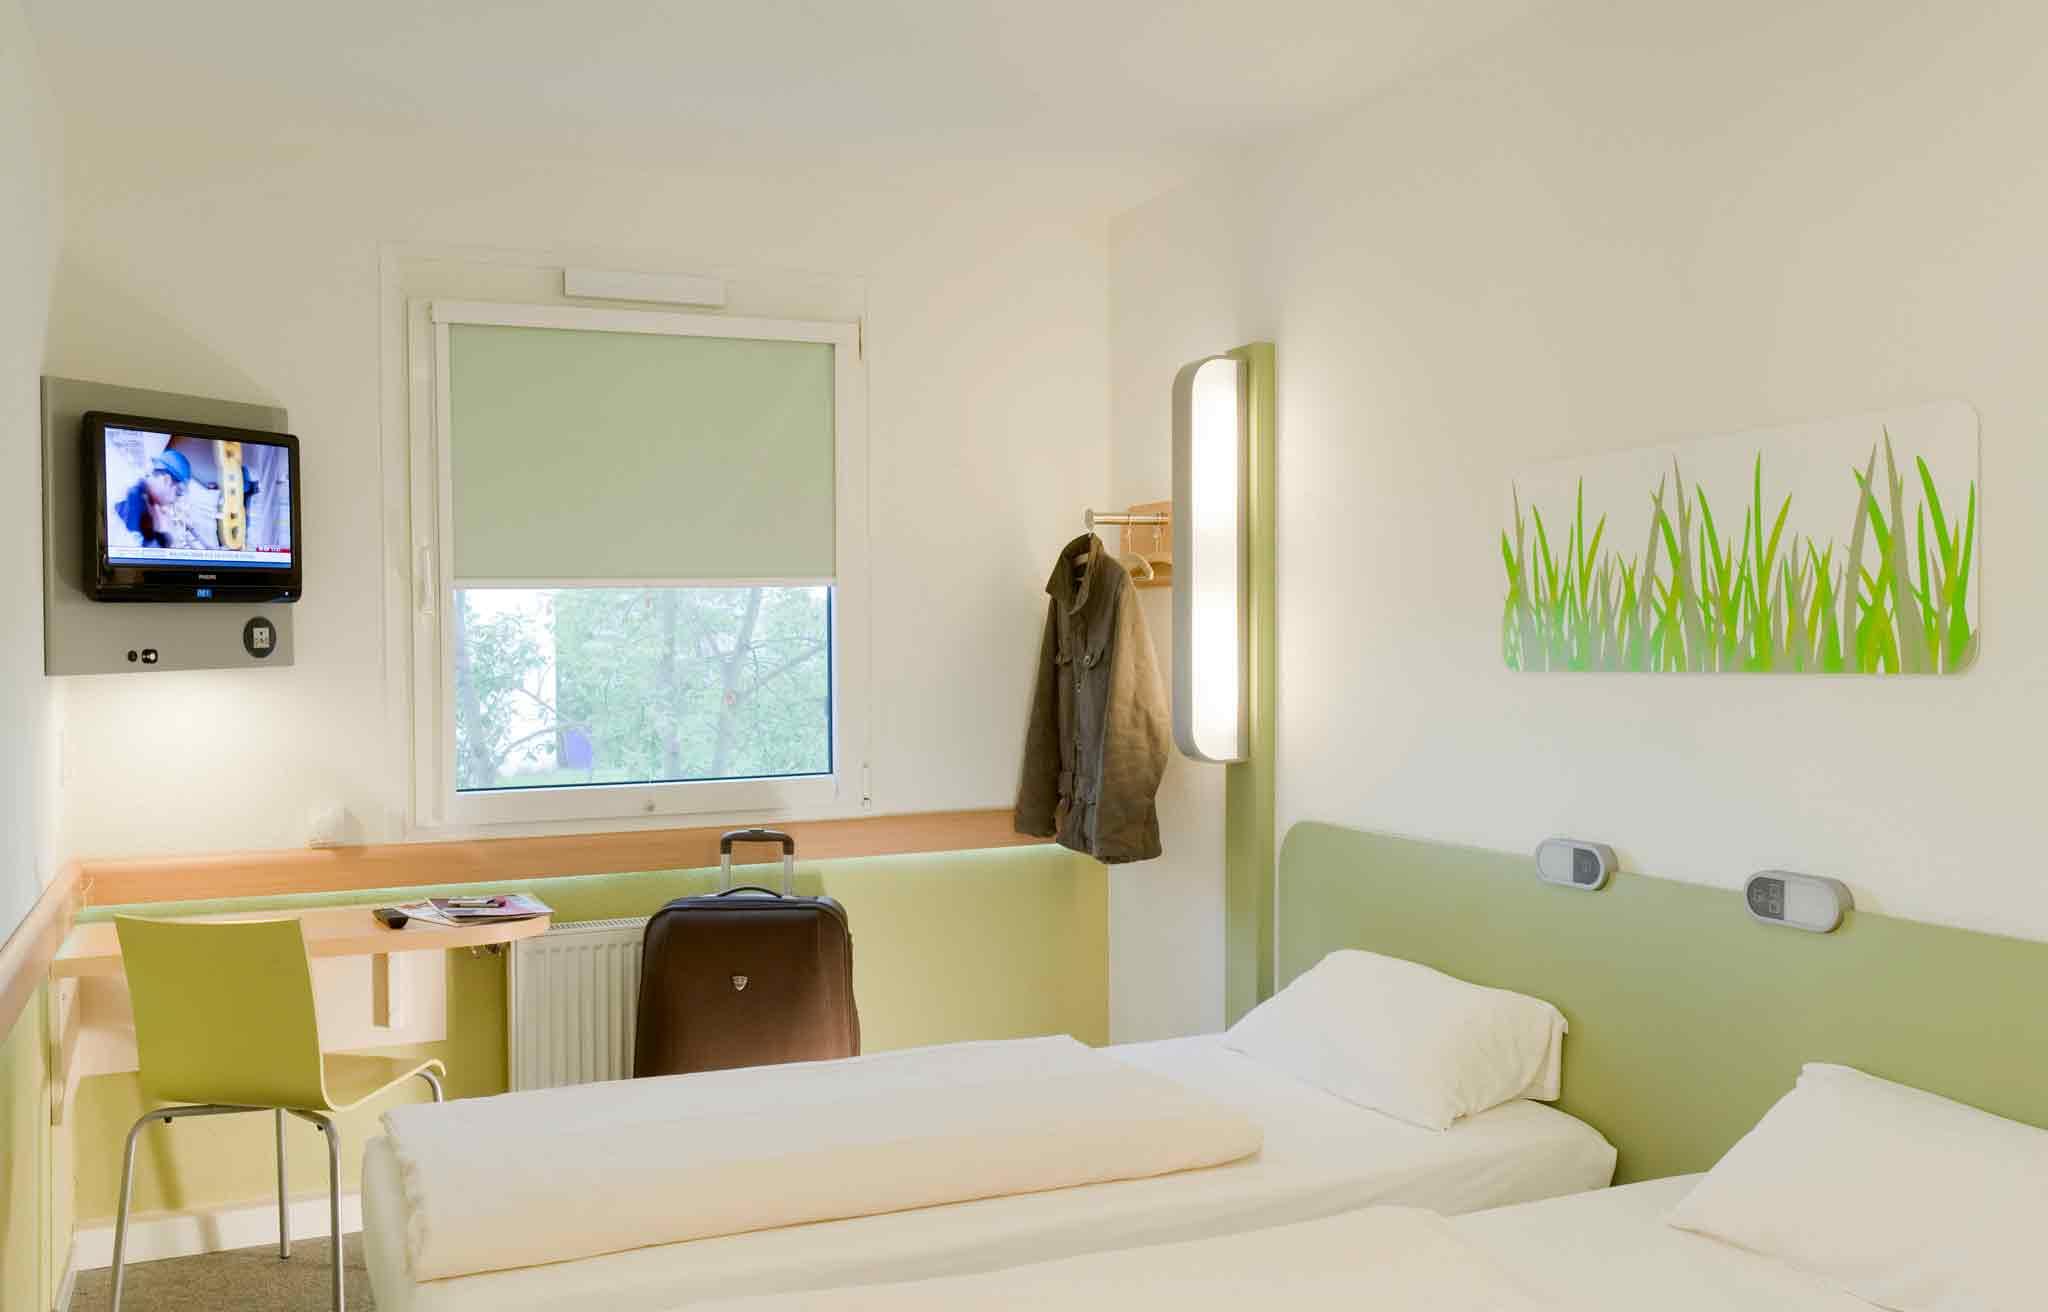 h tel le puy en velay ibis budget le puy en velay. Black Bedroom Furniture Sets. Home Design Ideas